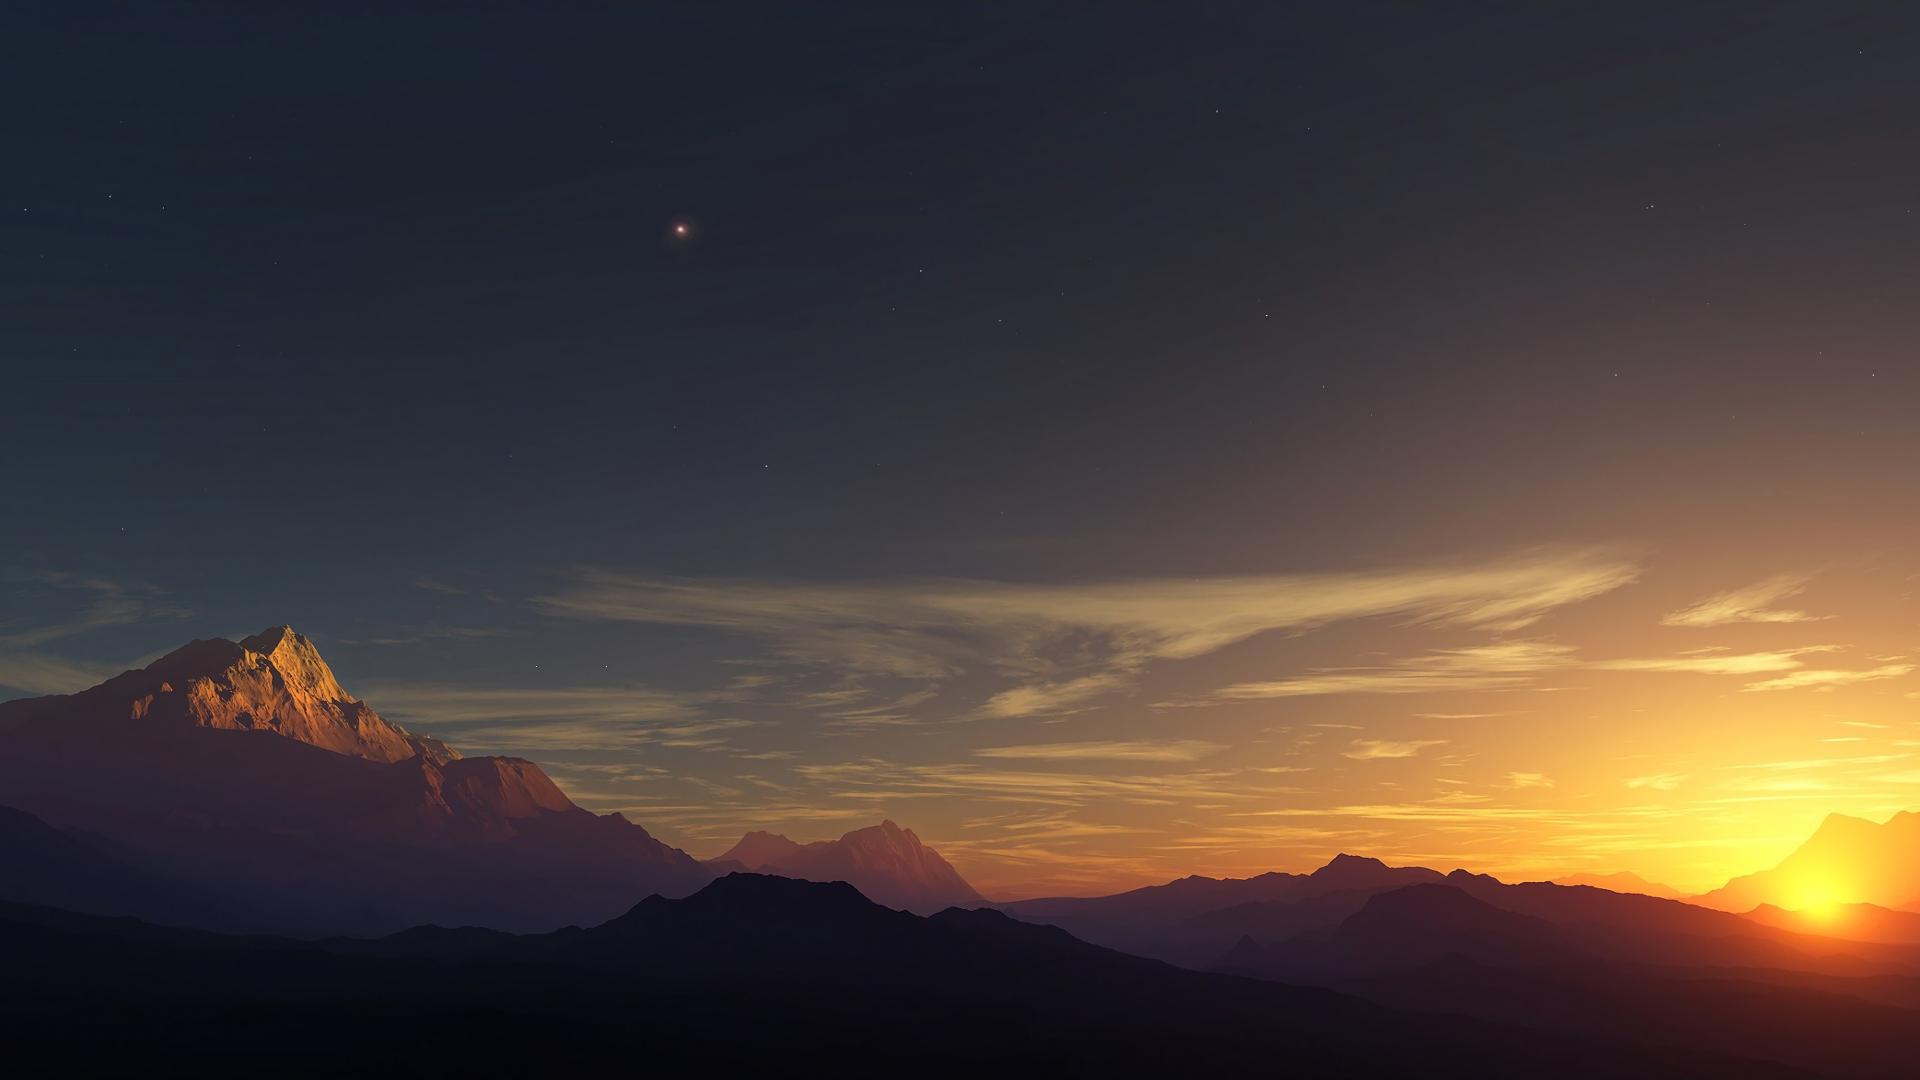 General 1920x1080 Sun mountains nature sky dusk sunset